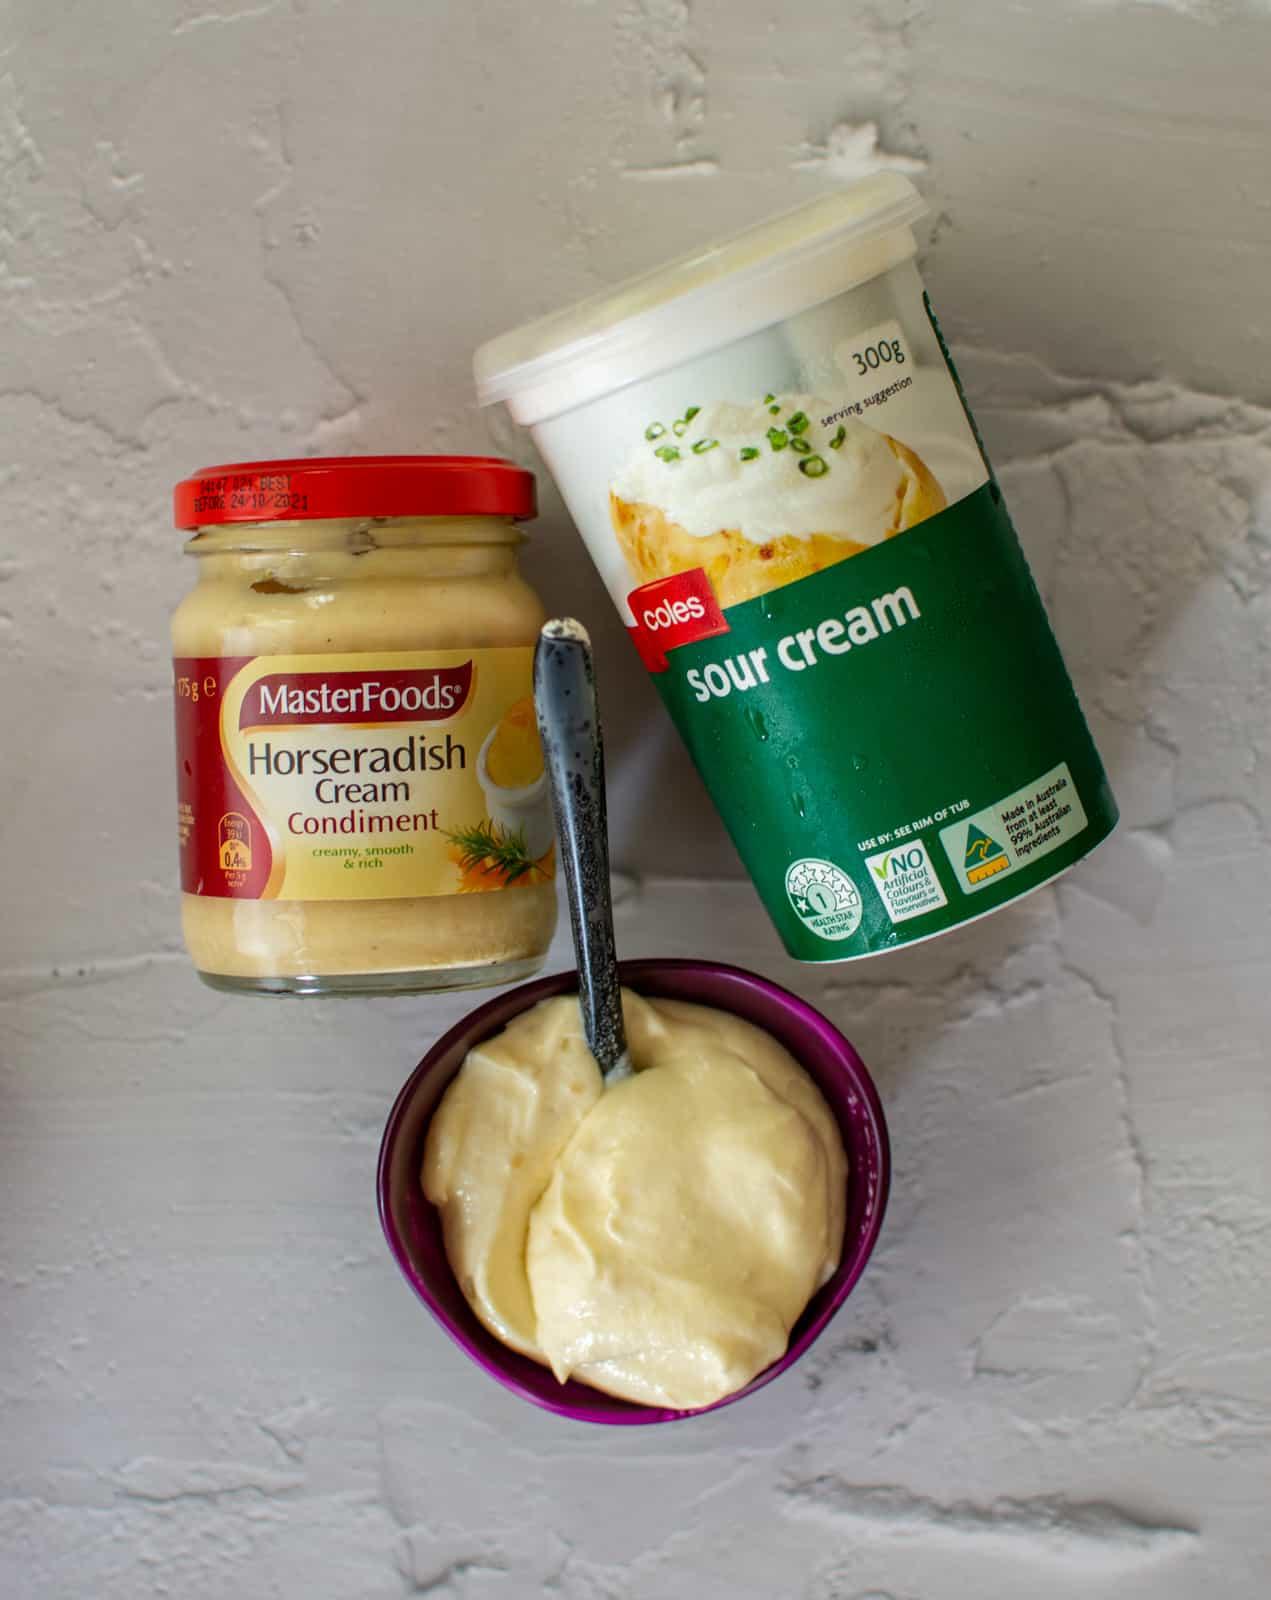 horseradish & sour cream on a white background